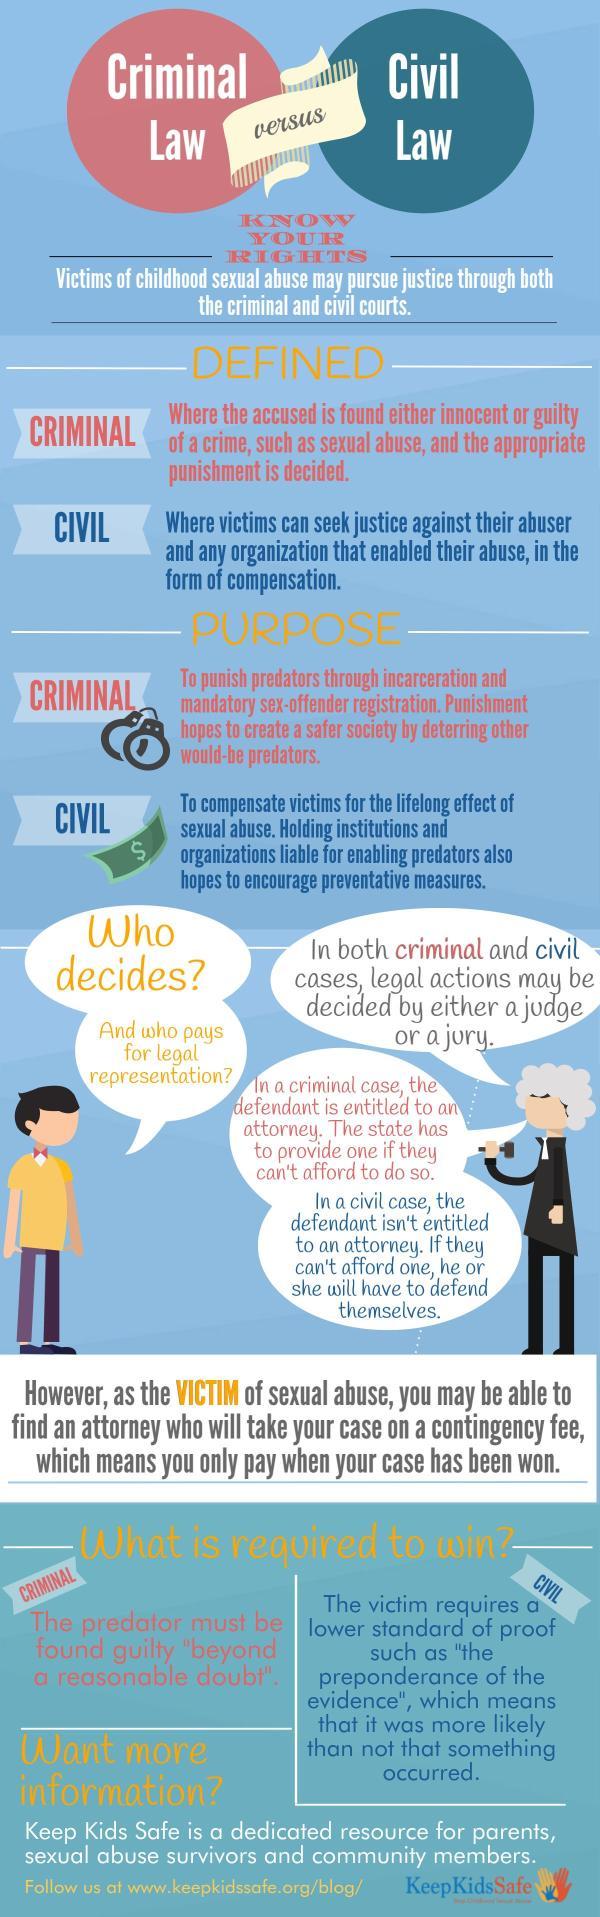 Civil vs. Criminal Law Infographic